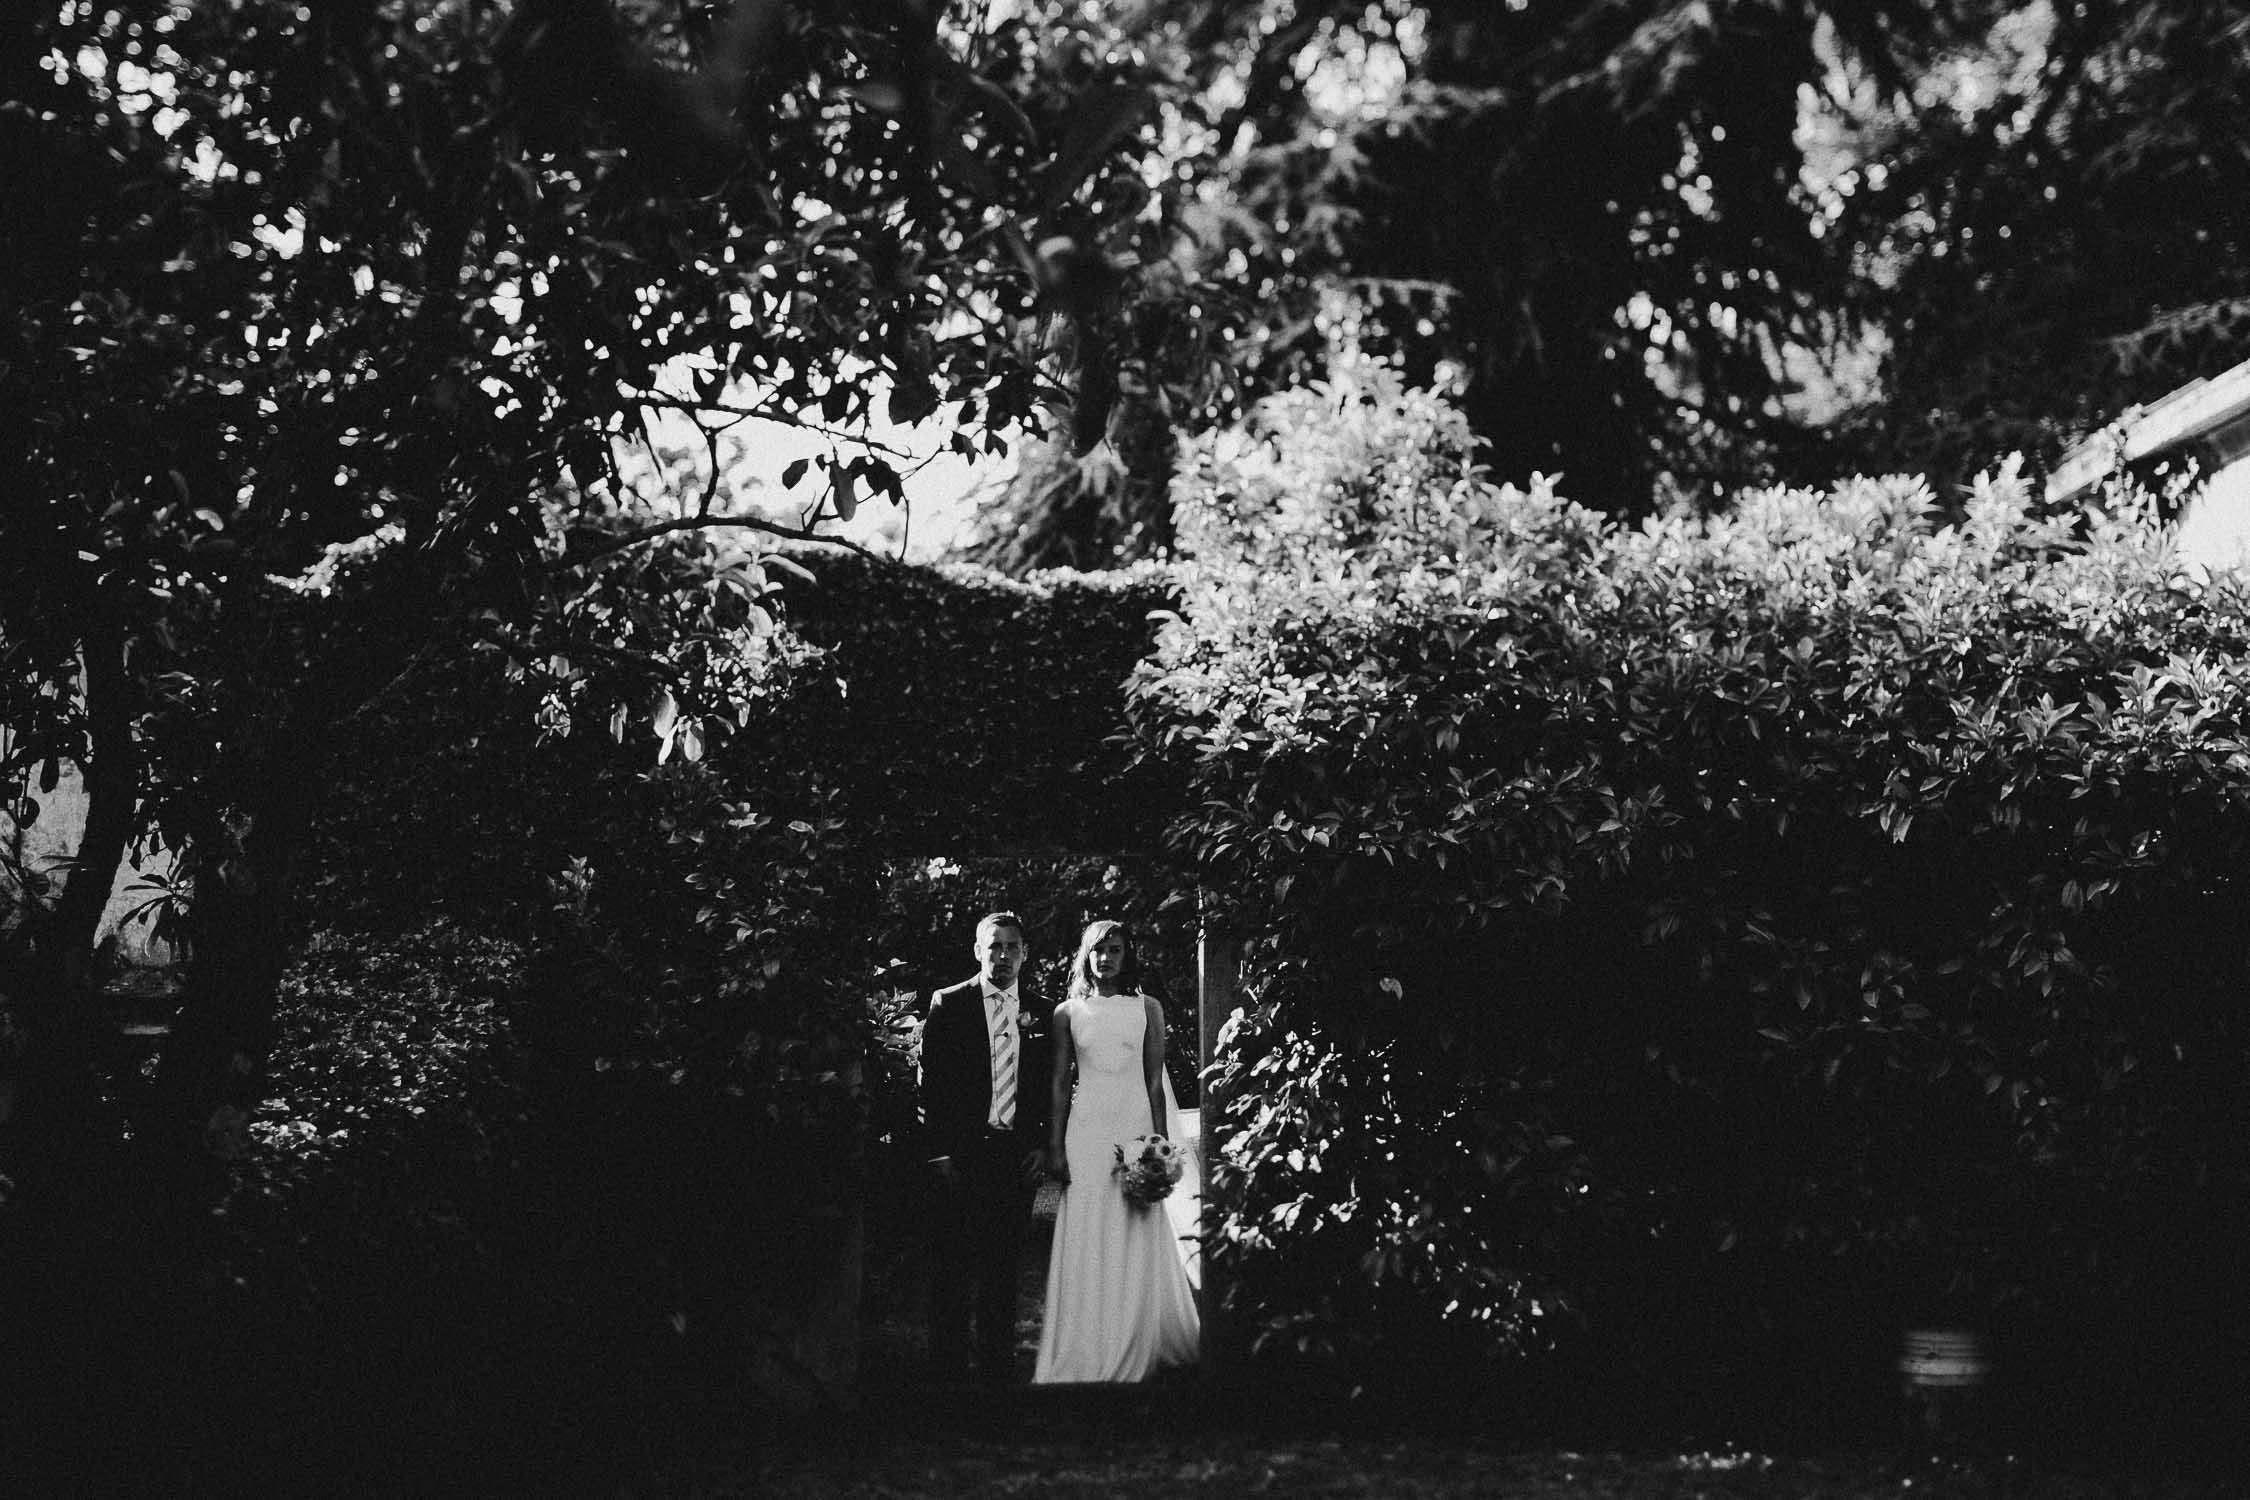 couple-portraits-destination-wedding (1).jpg